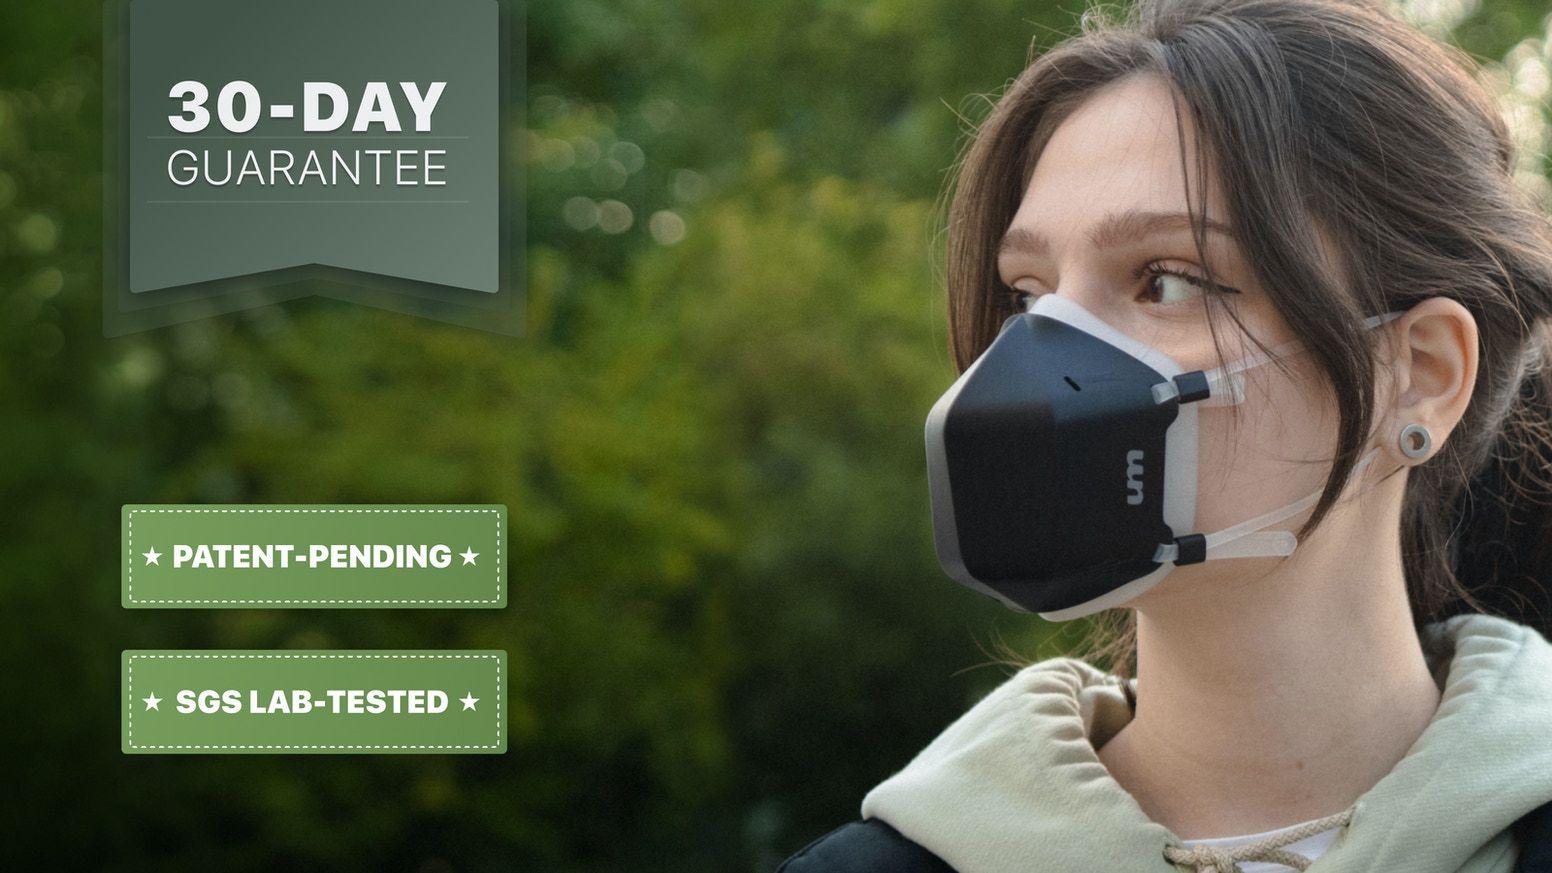 UVMask RealTime UVC Filtration & Purification Face Mask